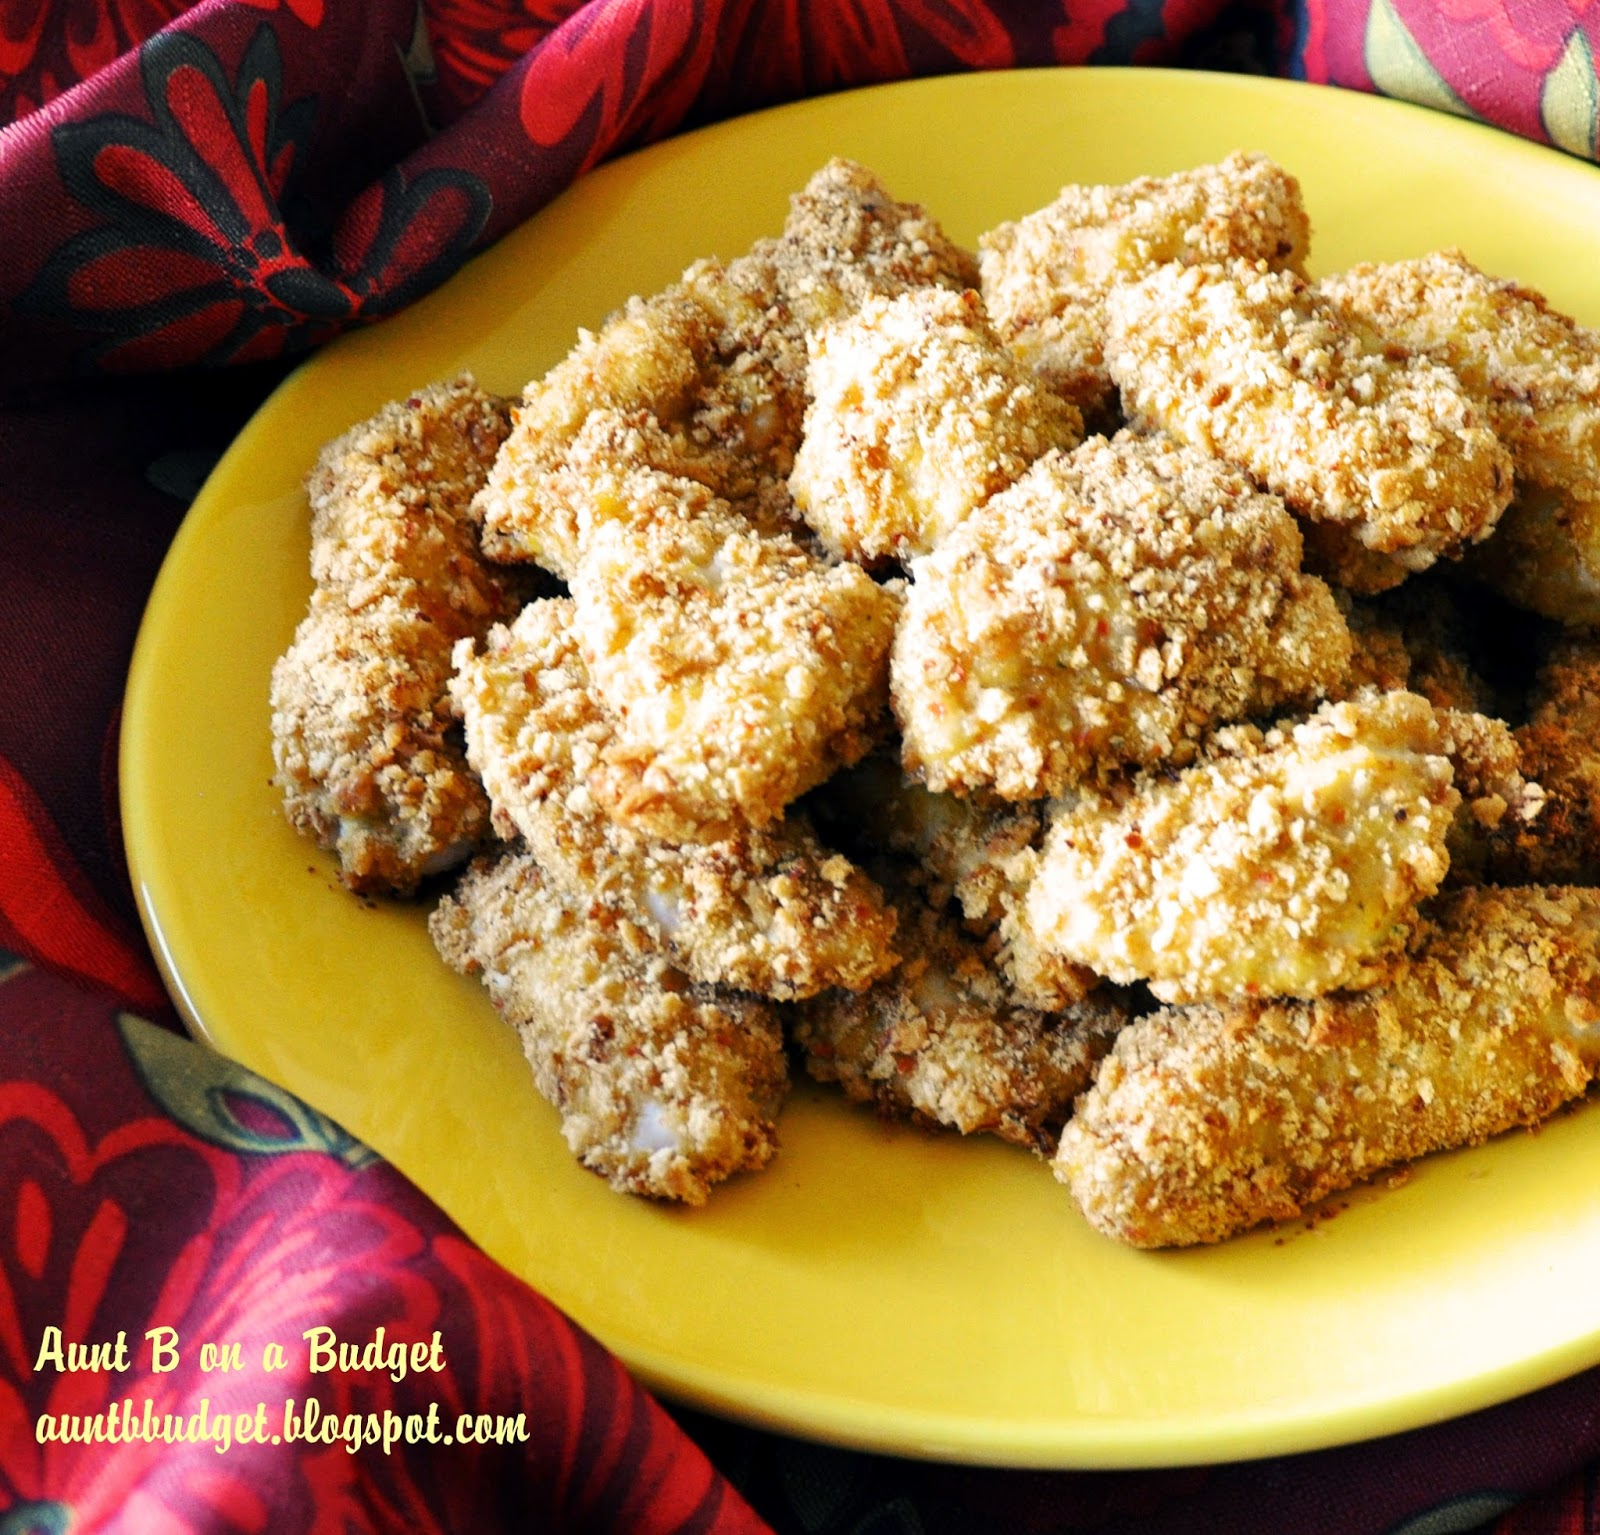 Aunt B on a Budget: Crispy Homemade Chicken Strips